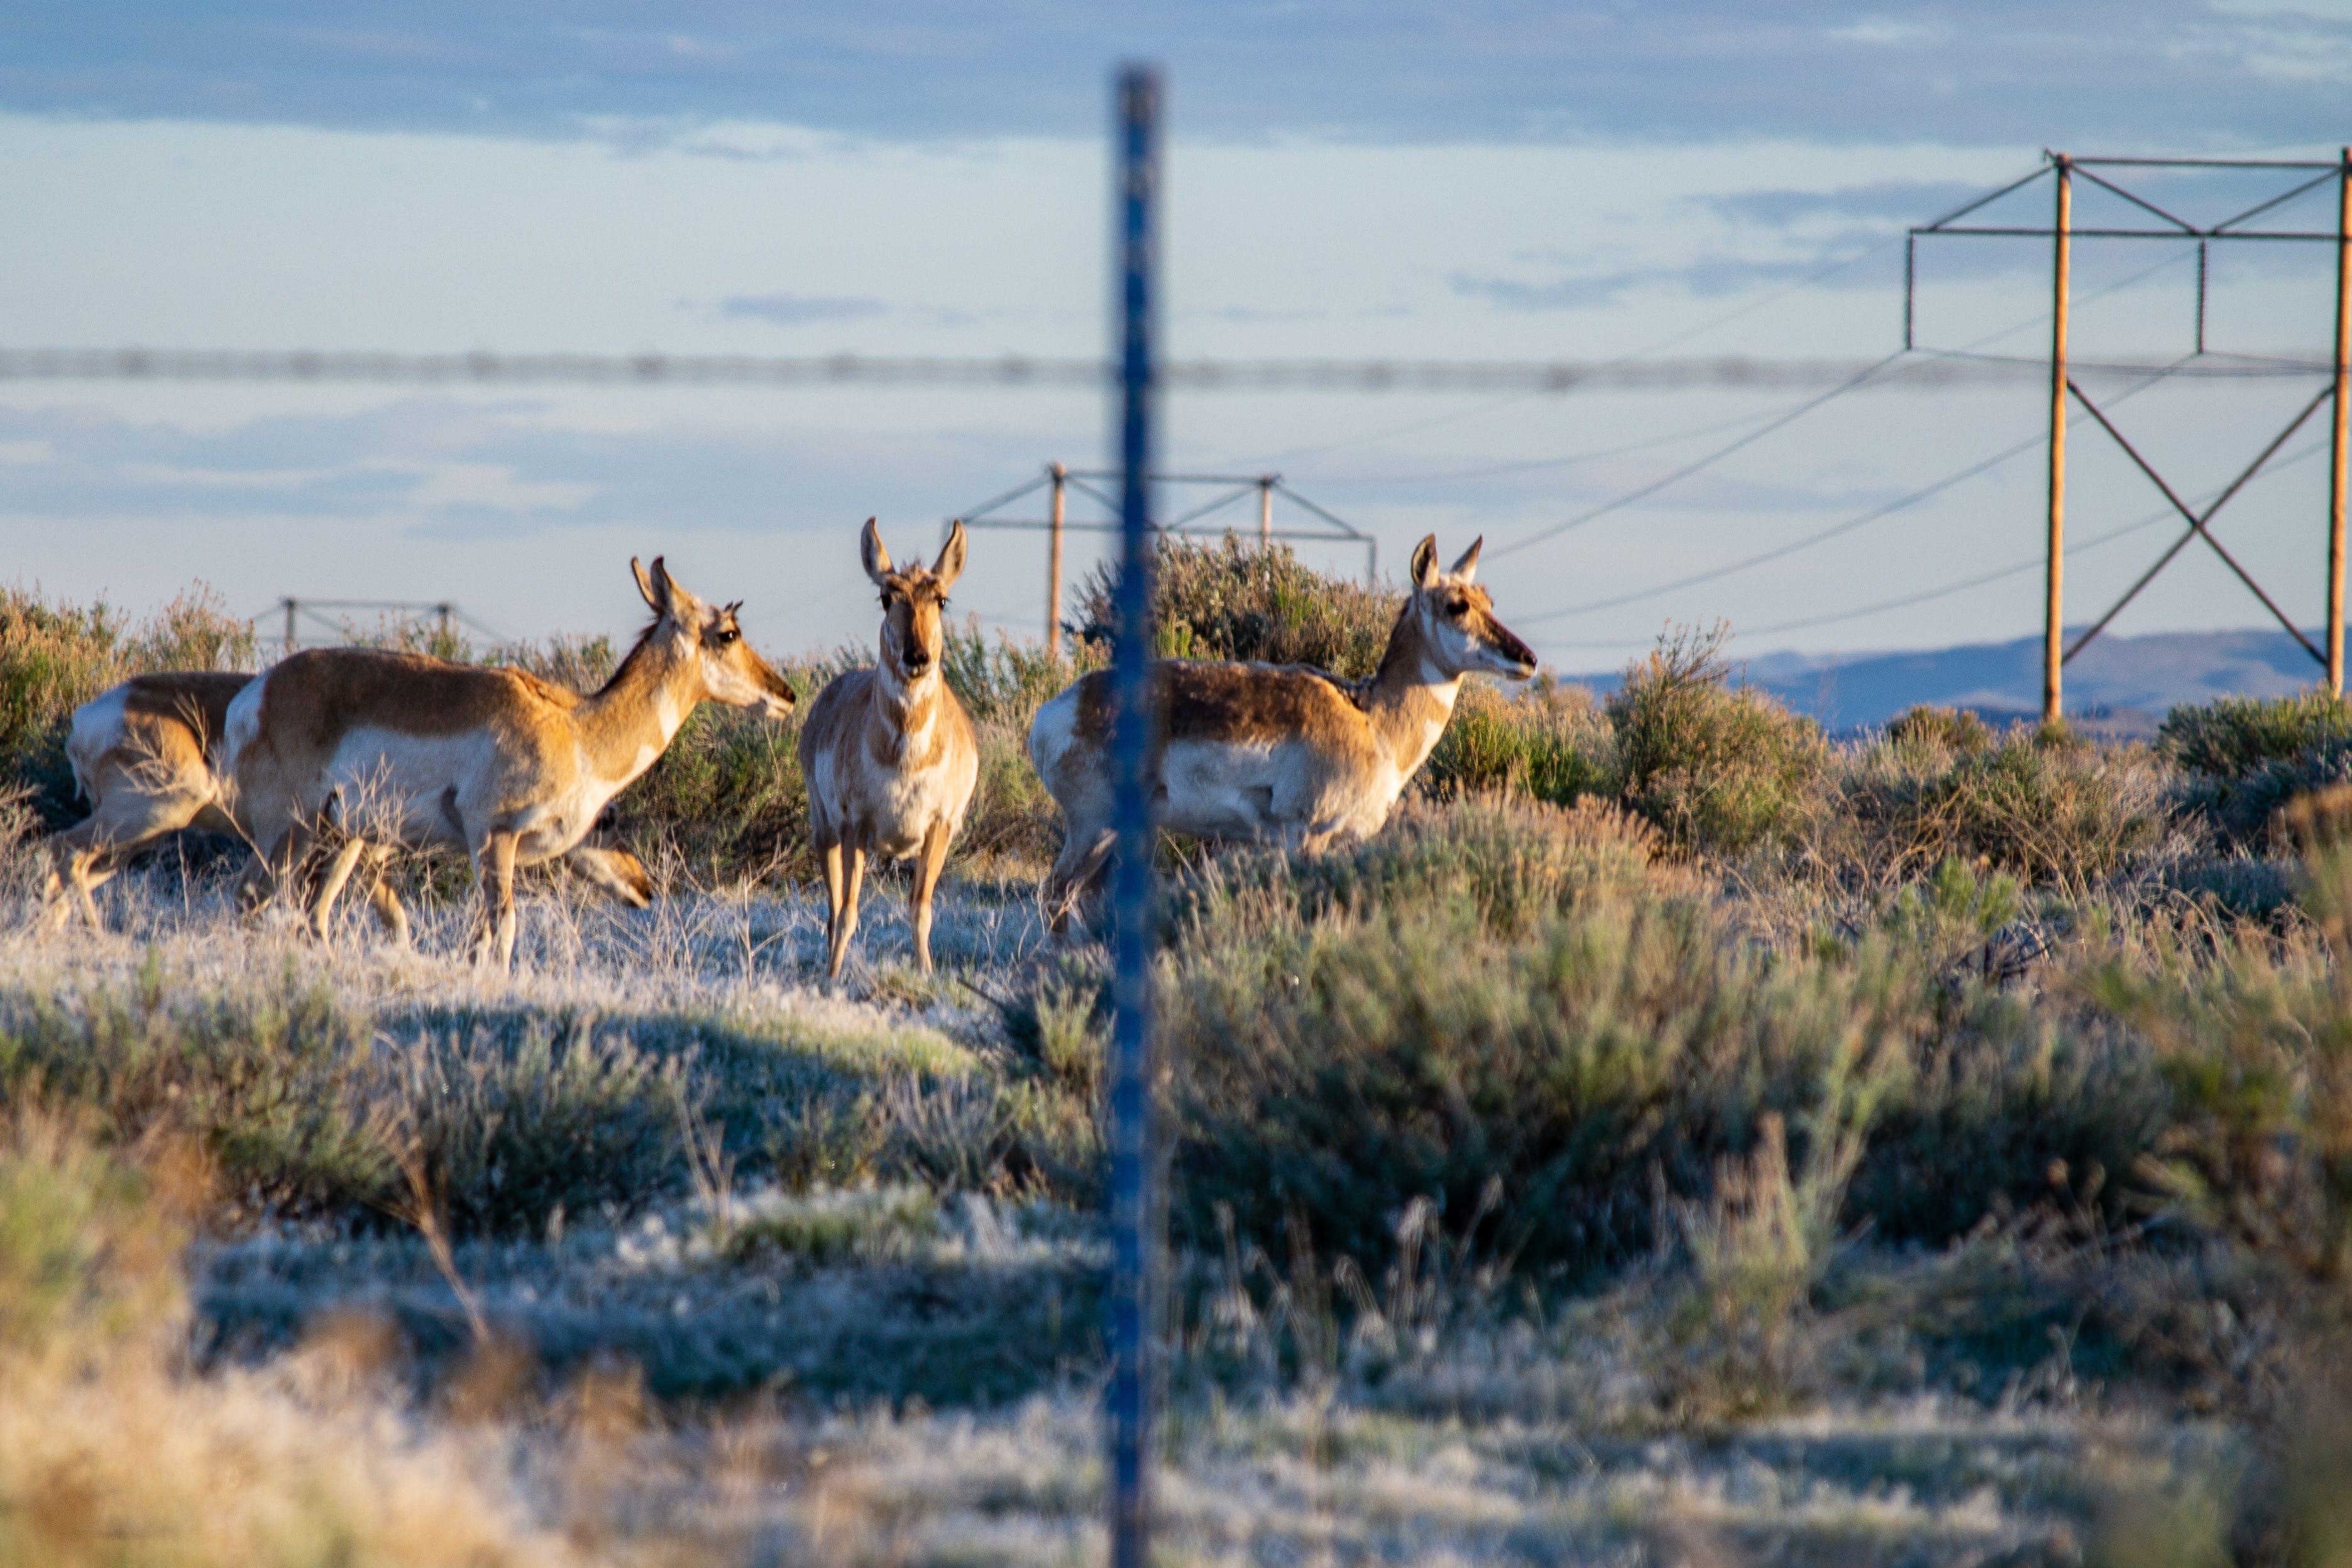 Foto d'estoc gratuïta de animal, antílop pronghorn, camp, camp de cereals